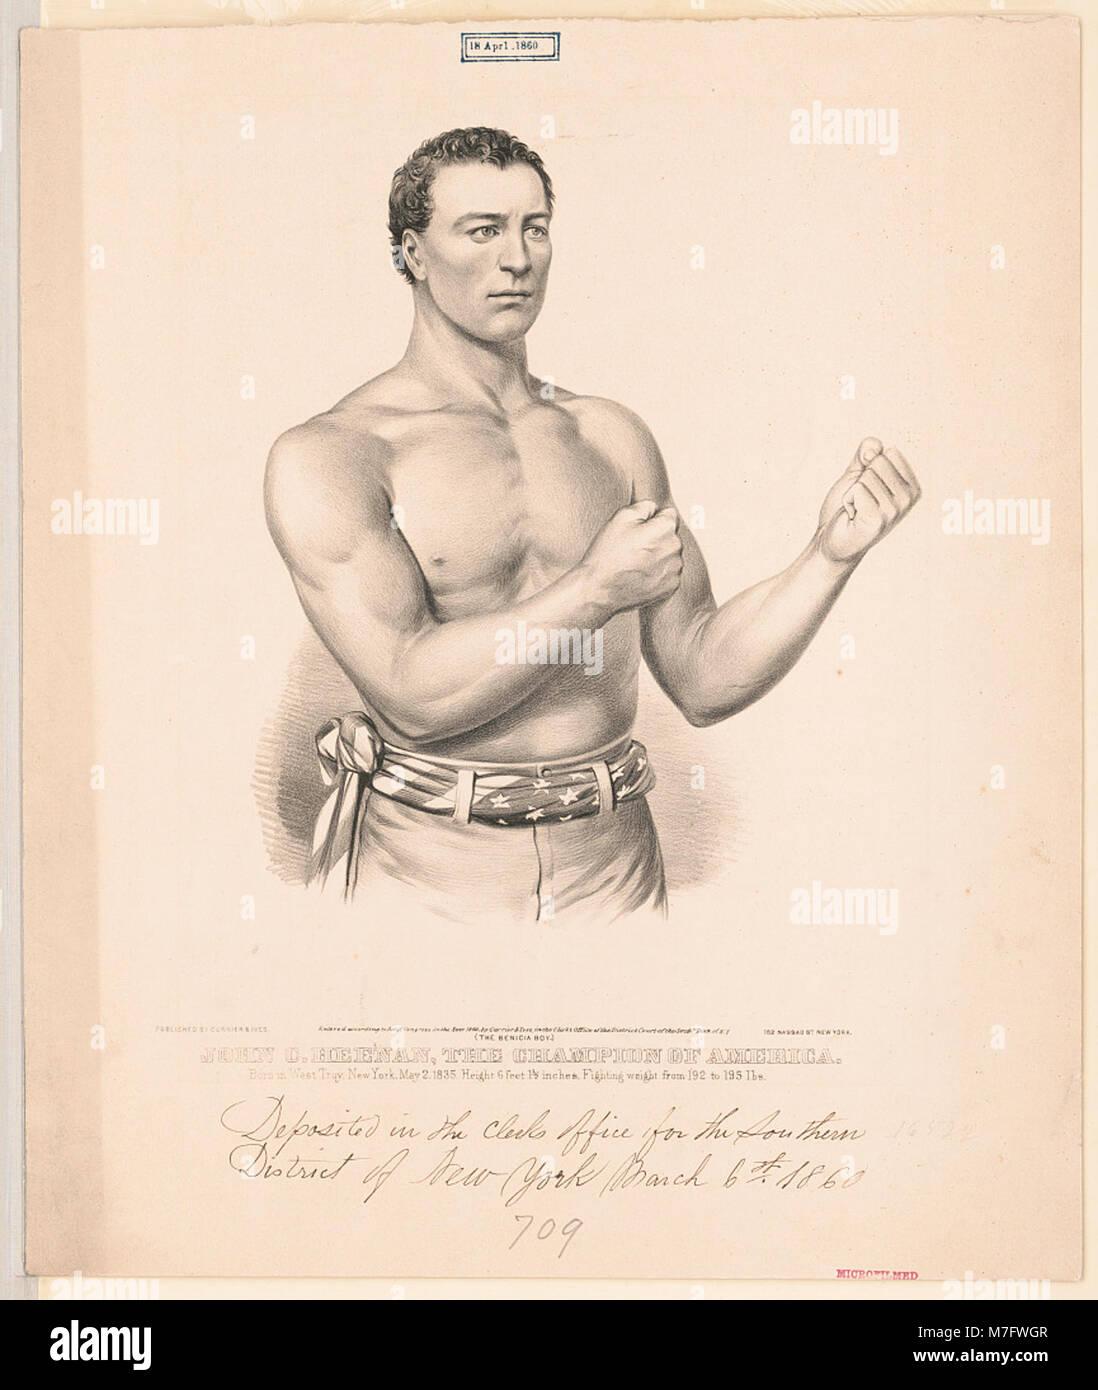 John C. Heenan, the champion of America- ('the benicia boy') LCCN2002707679 - Stock Image